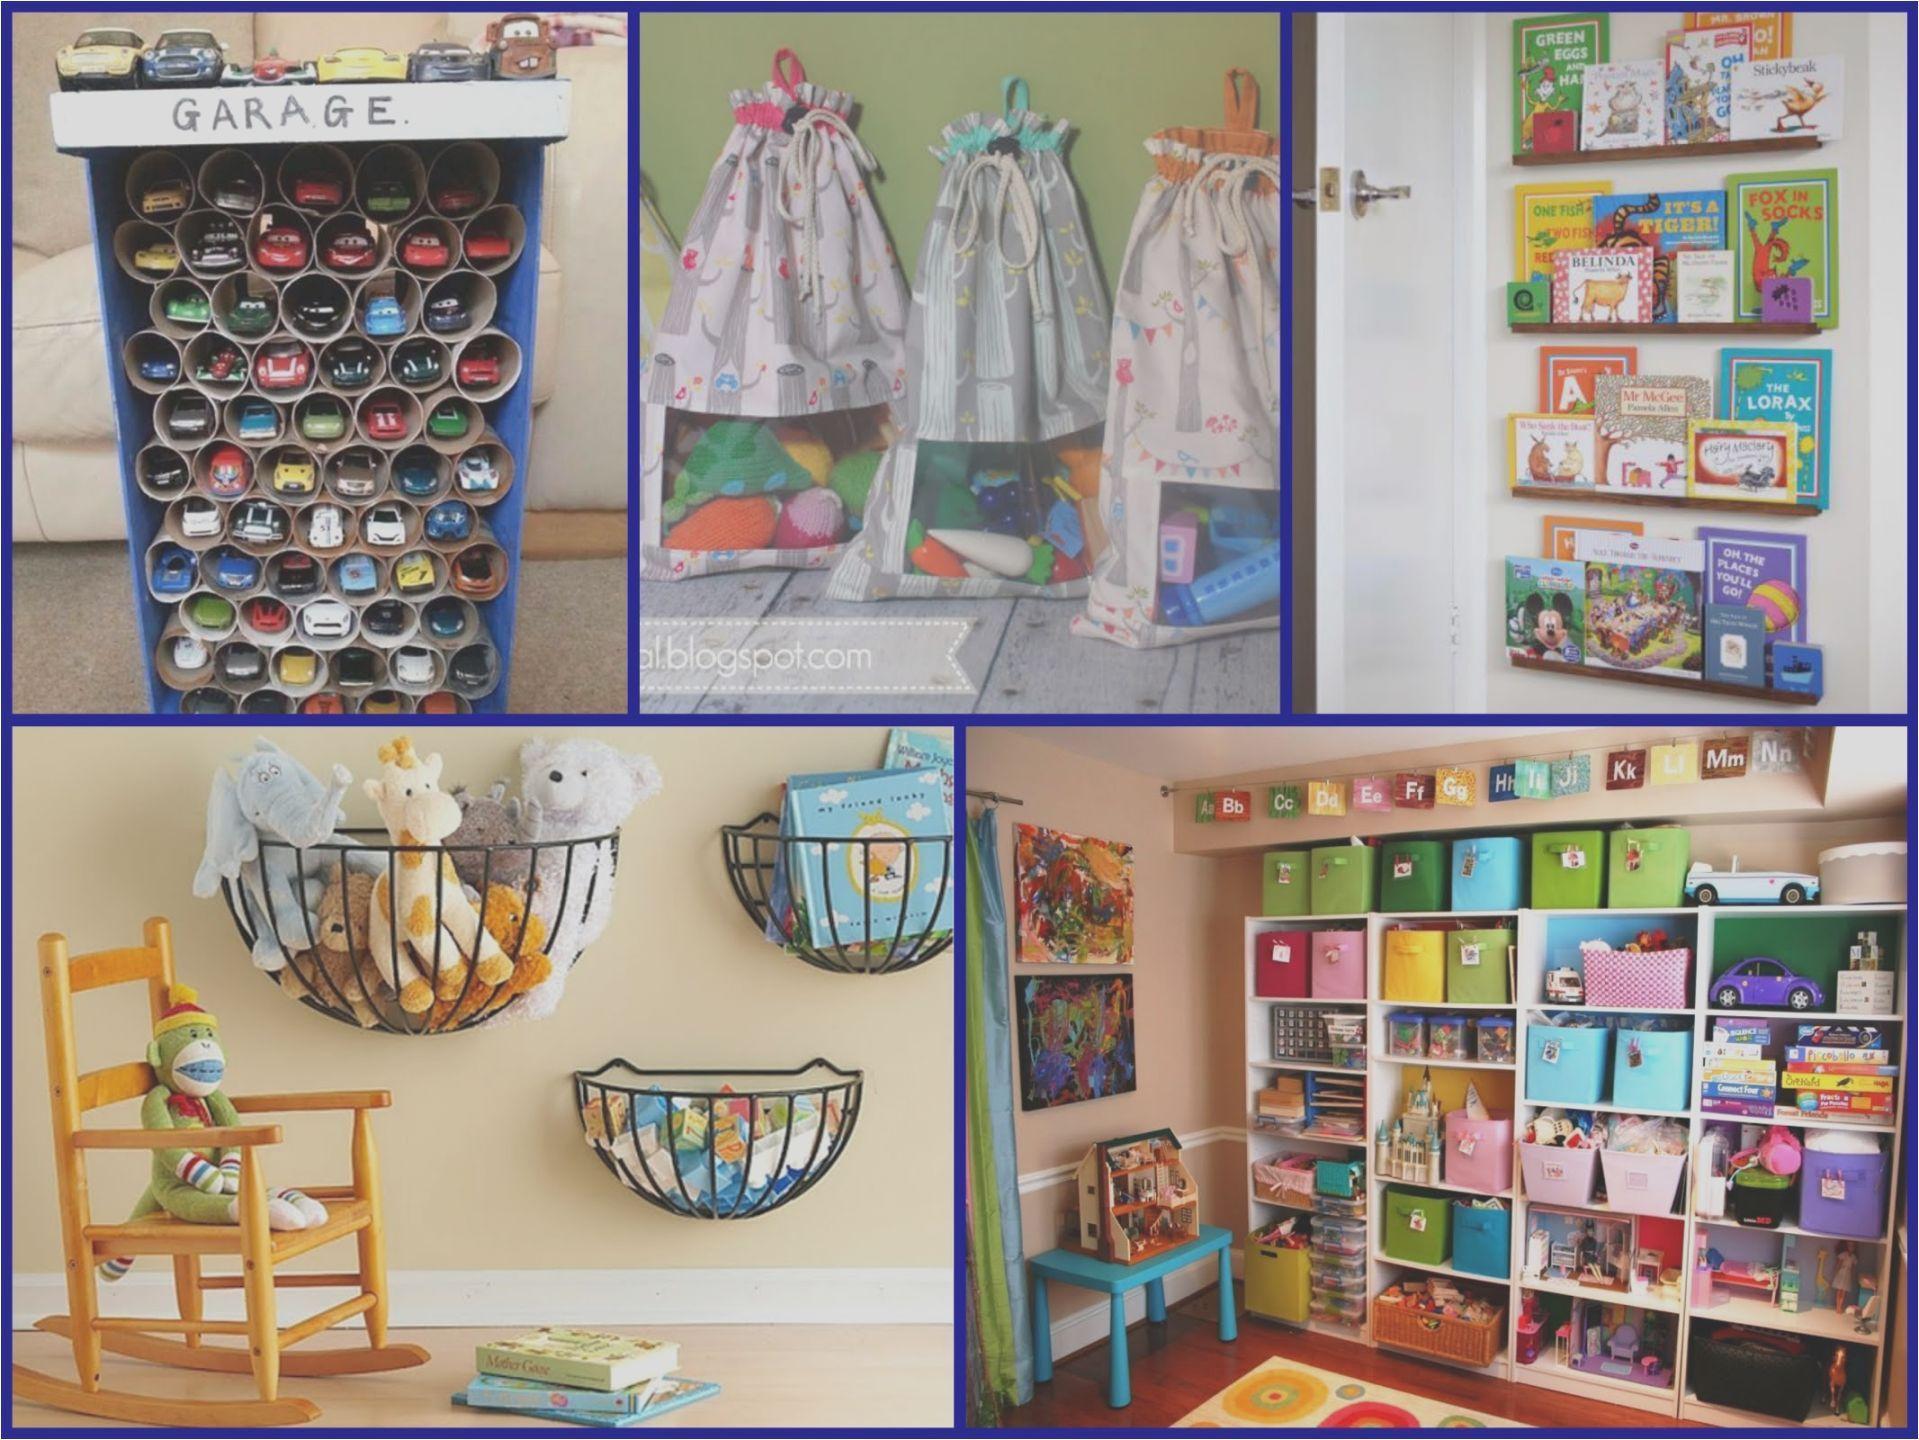 Toddler Bookshelf 20 Luxury Childrens Bedroom Storage Ideas House Ideas Bedroom Organization Diy Kids Room Organization Home Organization